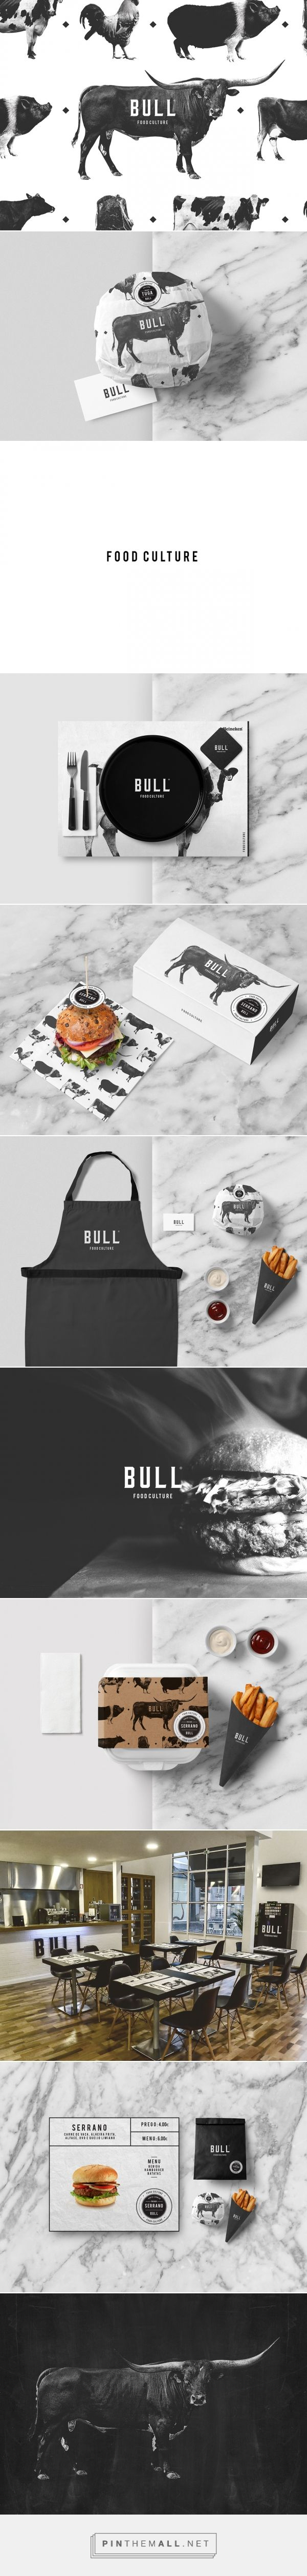 BULL - Food Culture packaging design by BULLSEYE (Portugal) - http://www.packagingoftheworld.com/2016/07/bull-food-culture.html